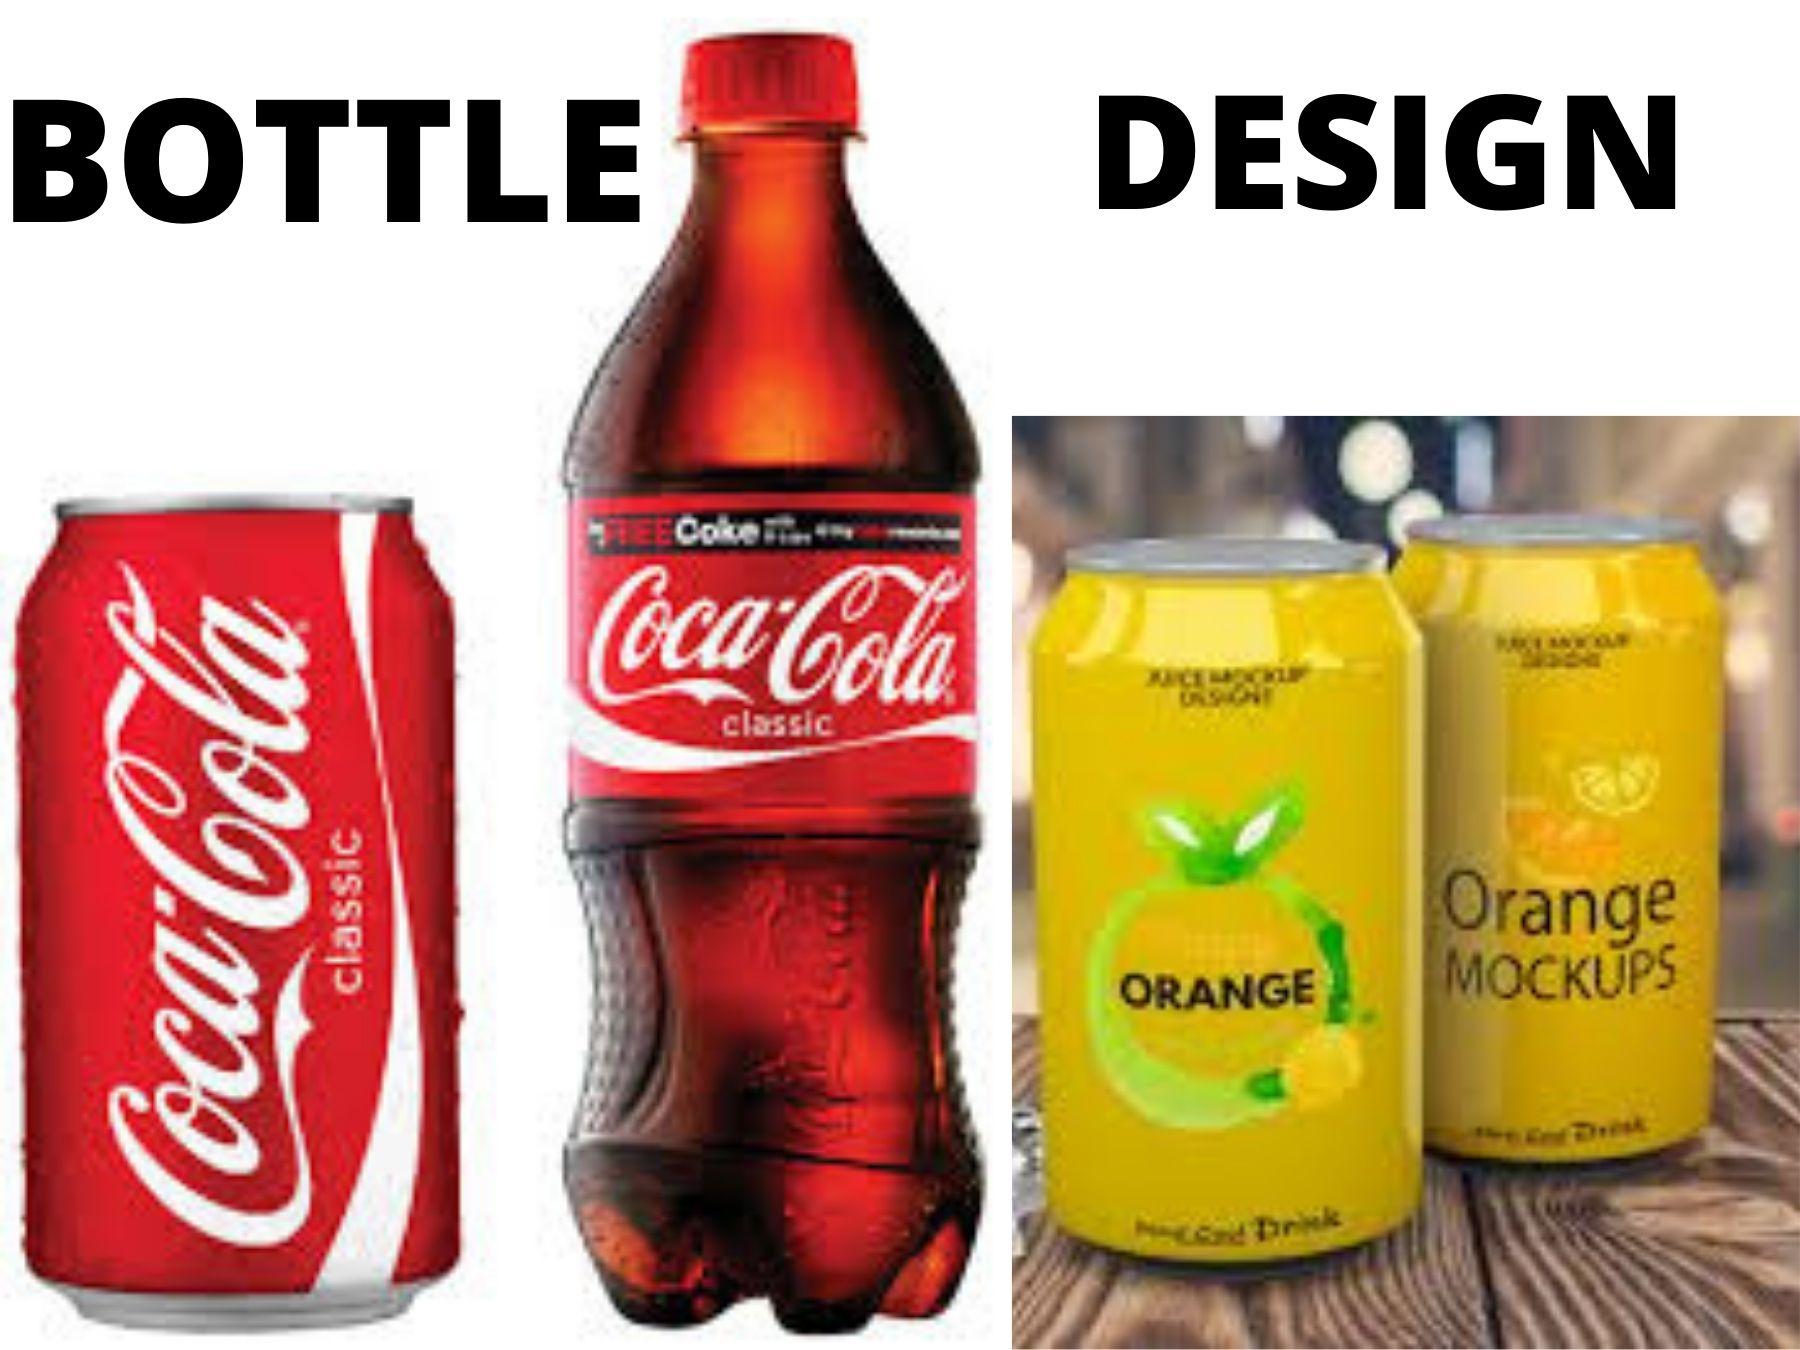 I will do design professional label bottle jar cans with mockup 3d